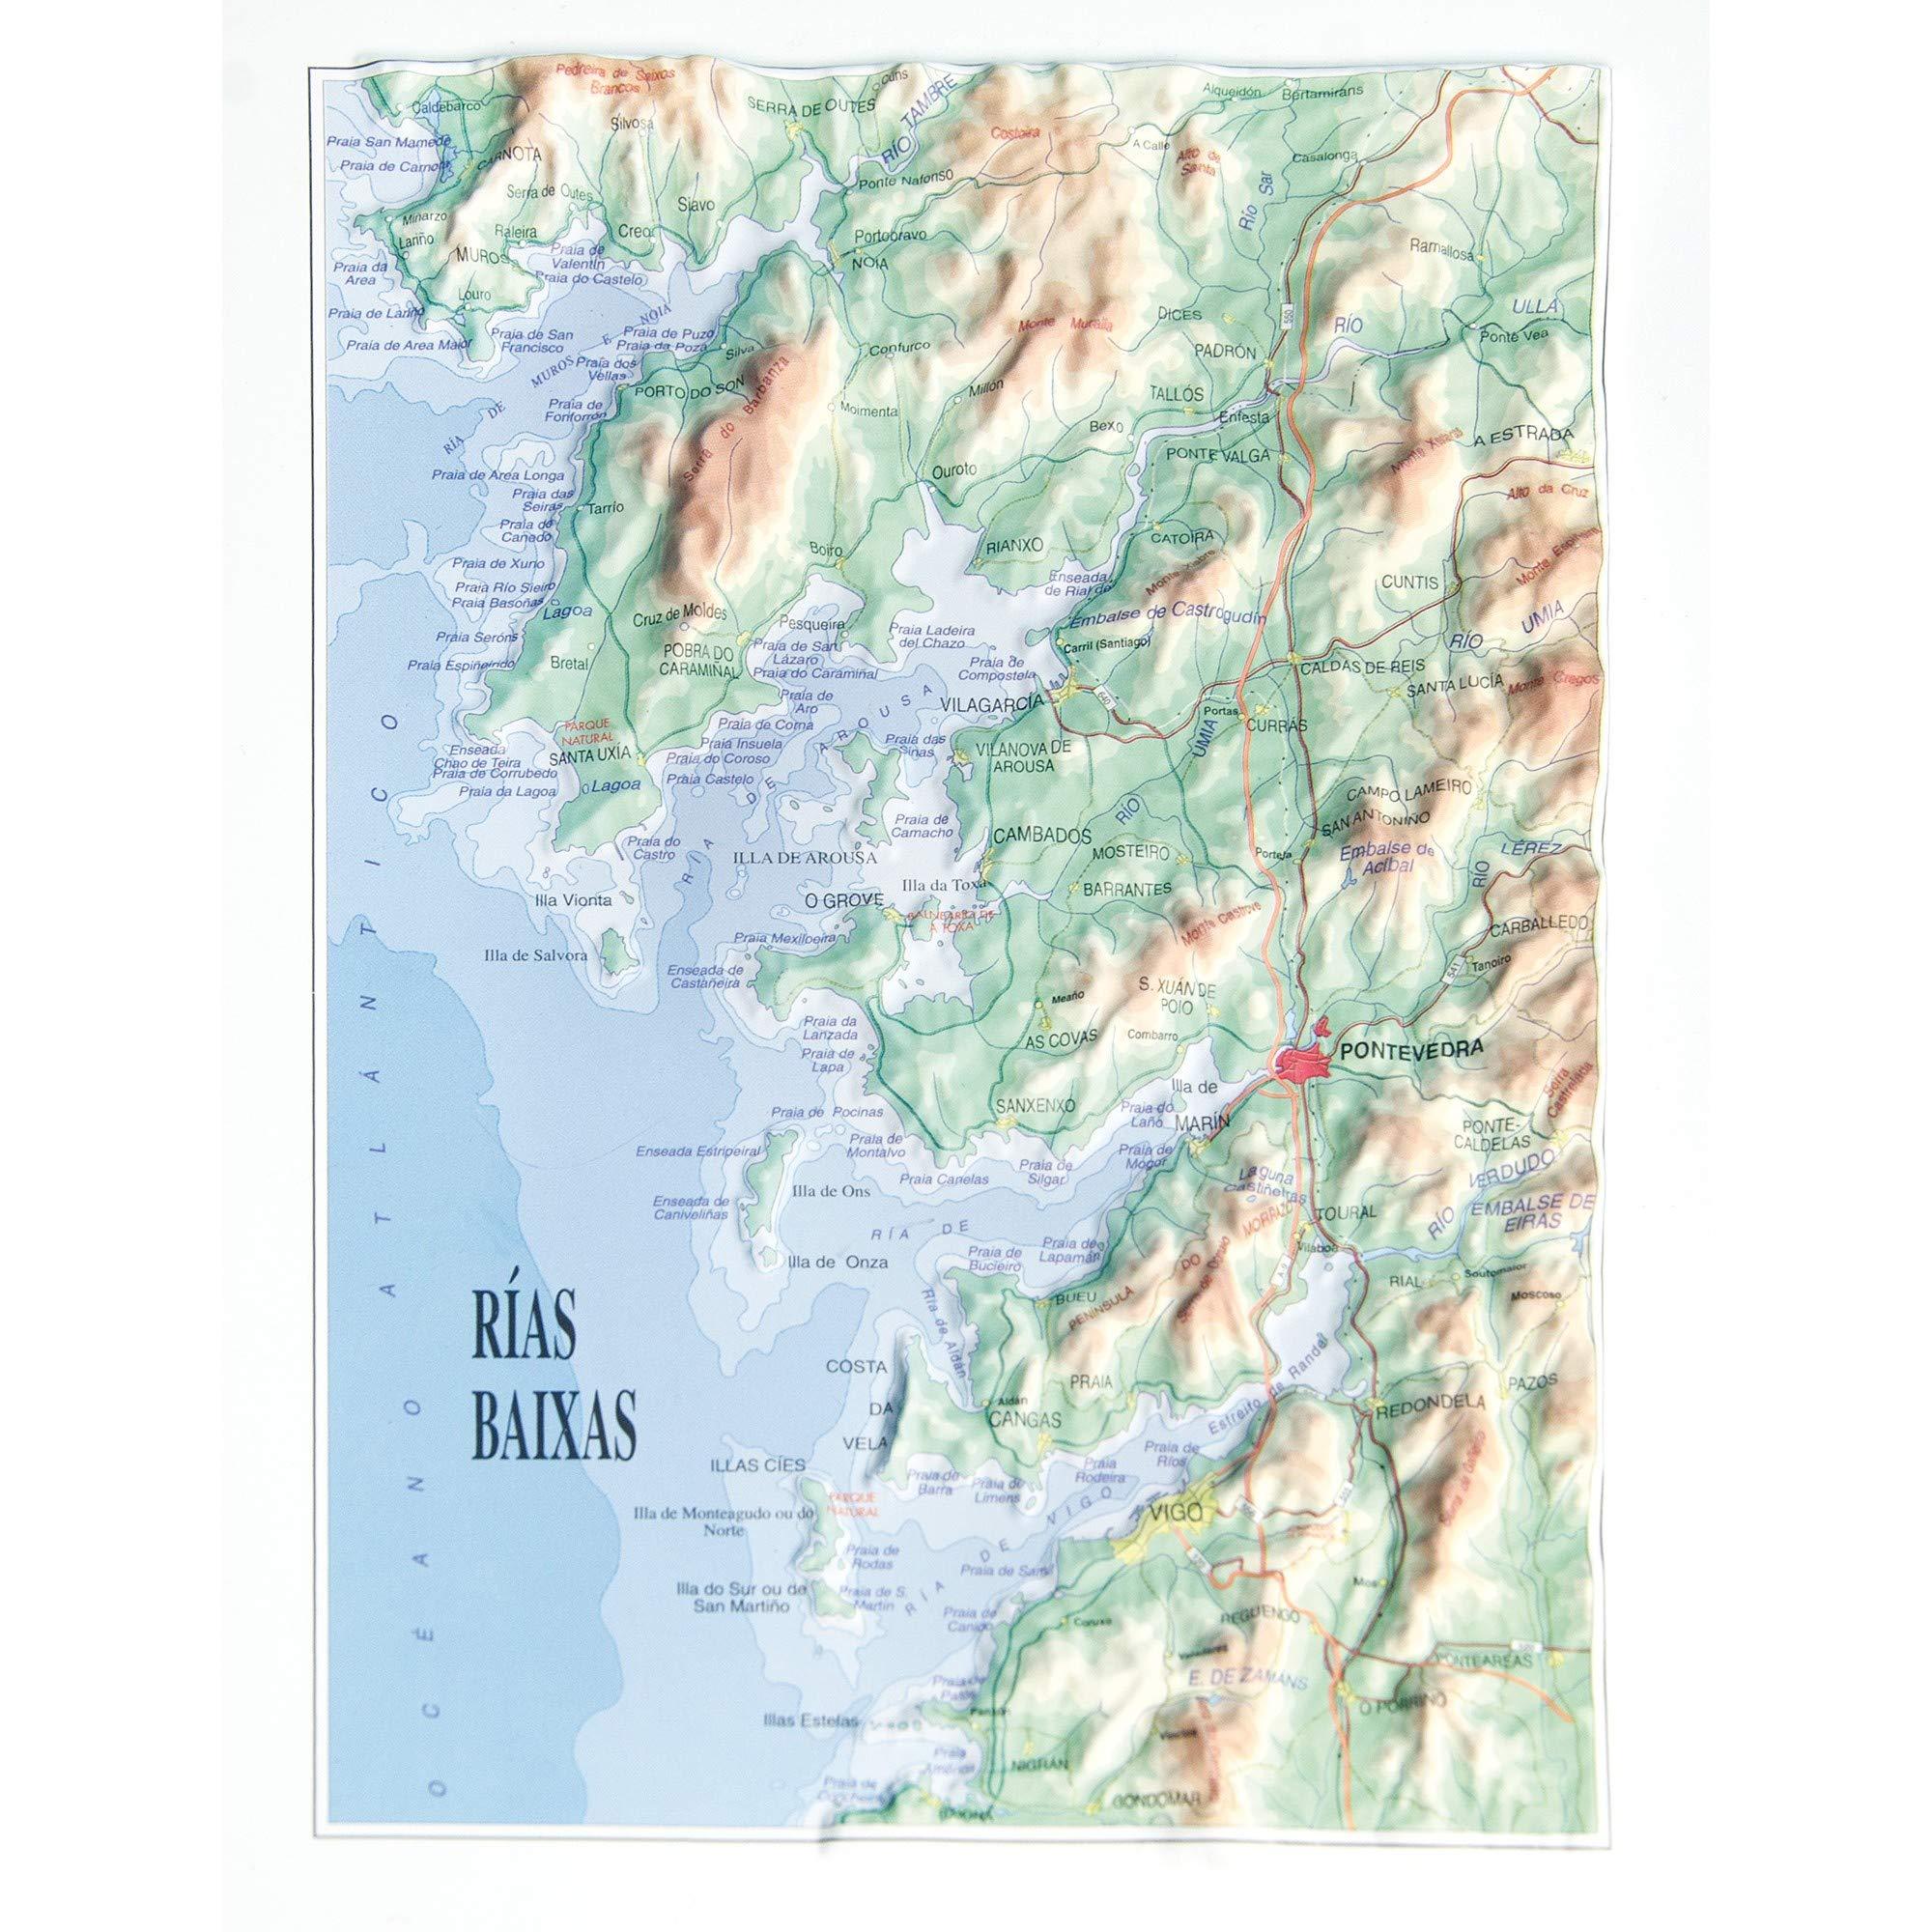 Mapa en relieve de Rias Baixas: Escala gráfica: Amazon.es: All 3D ...